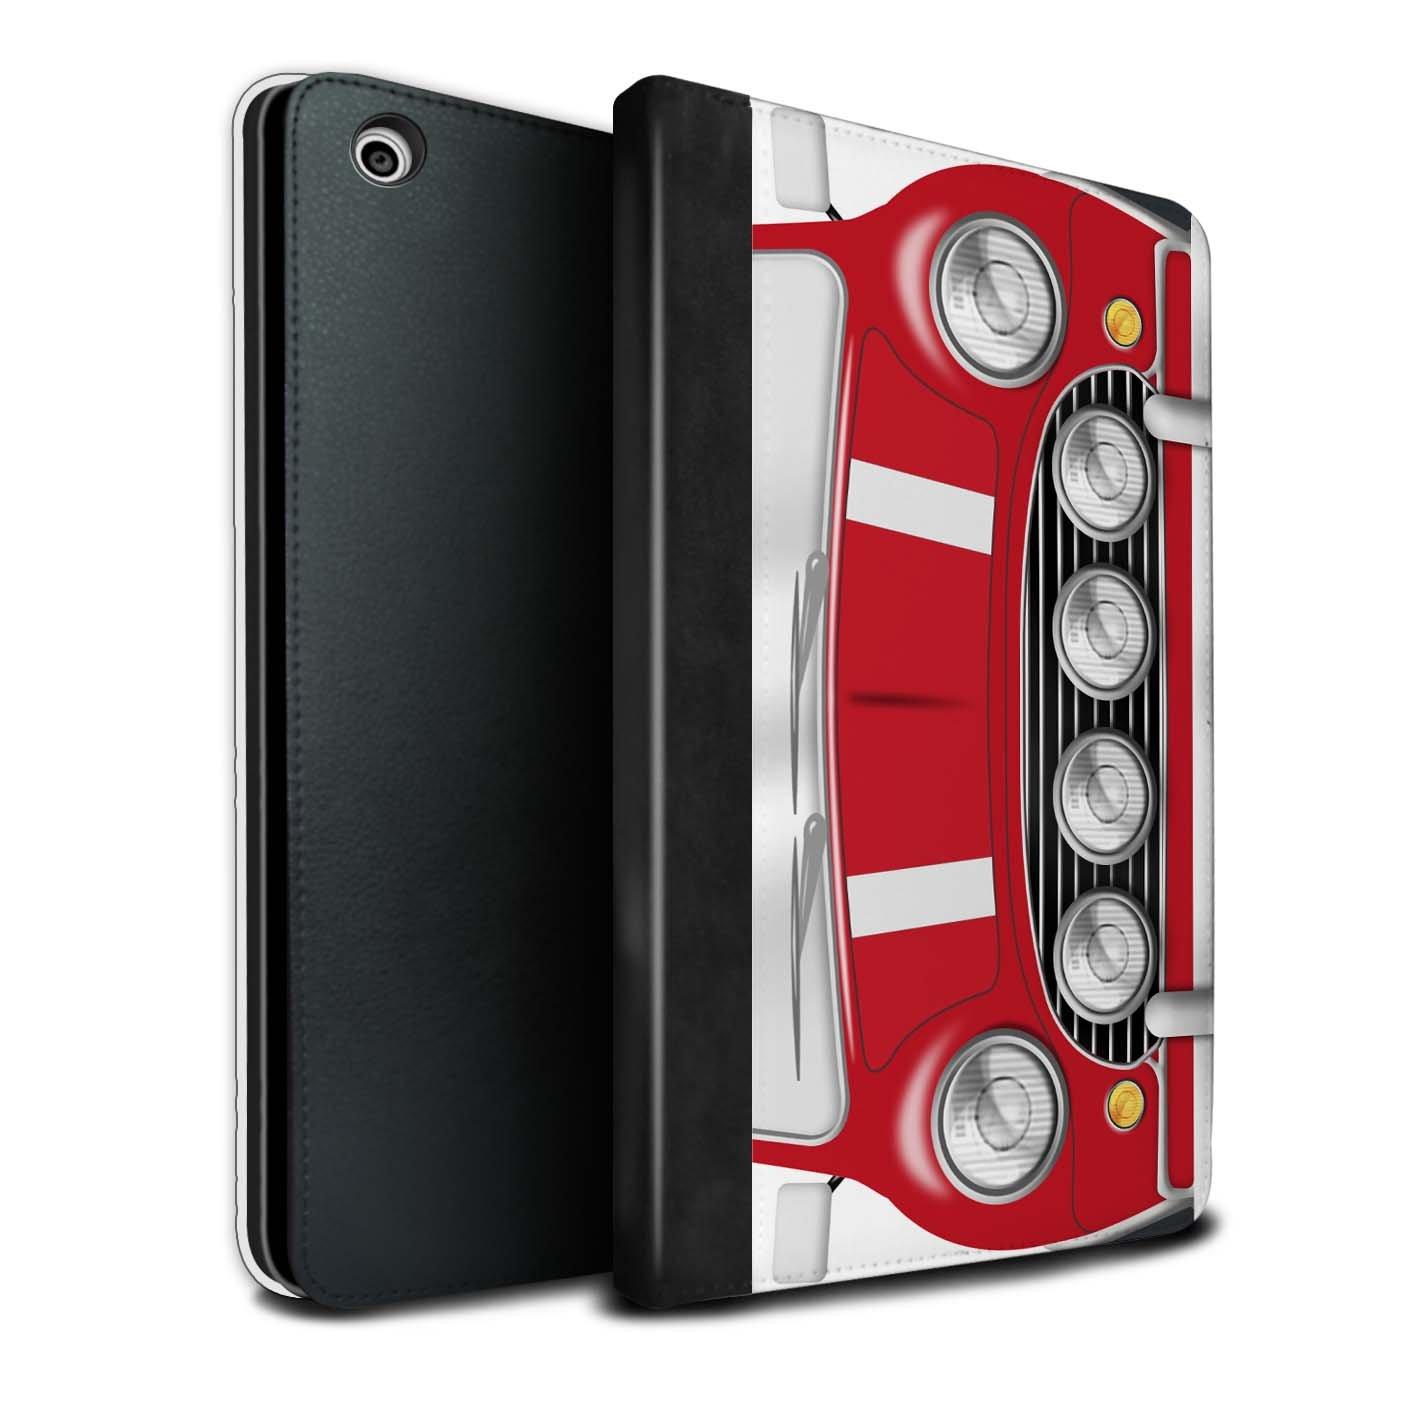 STUFF4 PU Leather Book/Cover Case for Apple iPad Mini 1/2/3 tablets / Solar Red Design / Classic Retro Mini Collection